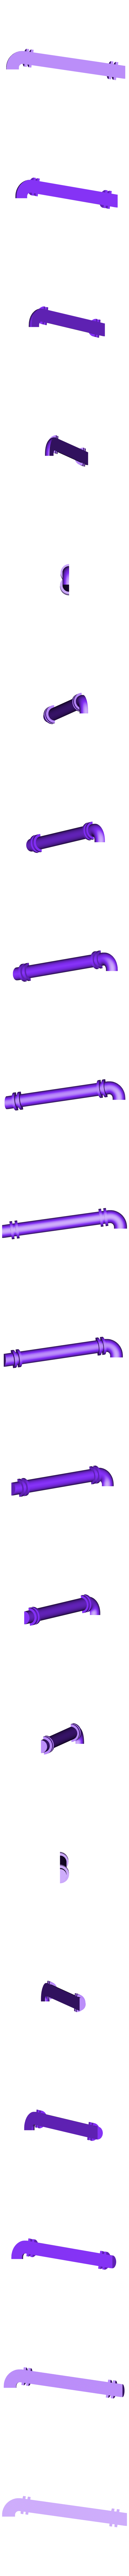 Steam_Pipe_-_Back_Engine-e.STL Download free STL file 4-8-8-4 Big Boy Locomotive • 3D printer object, RaymondDeLuca